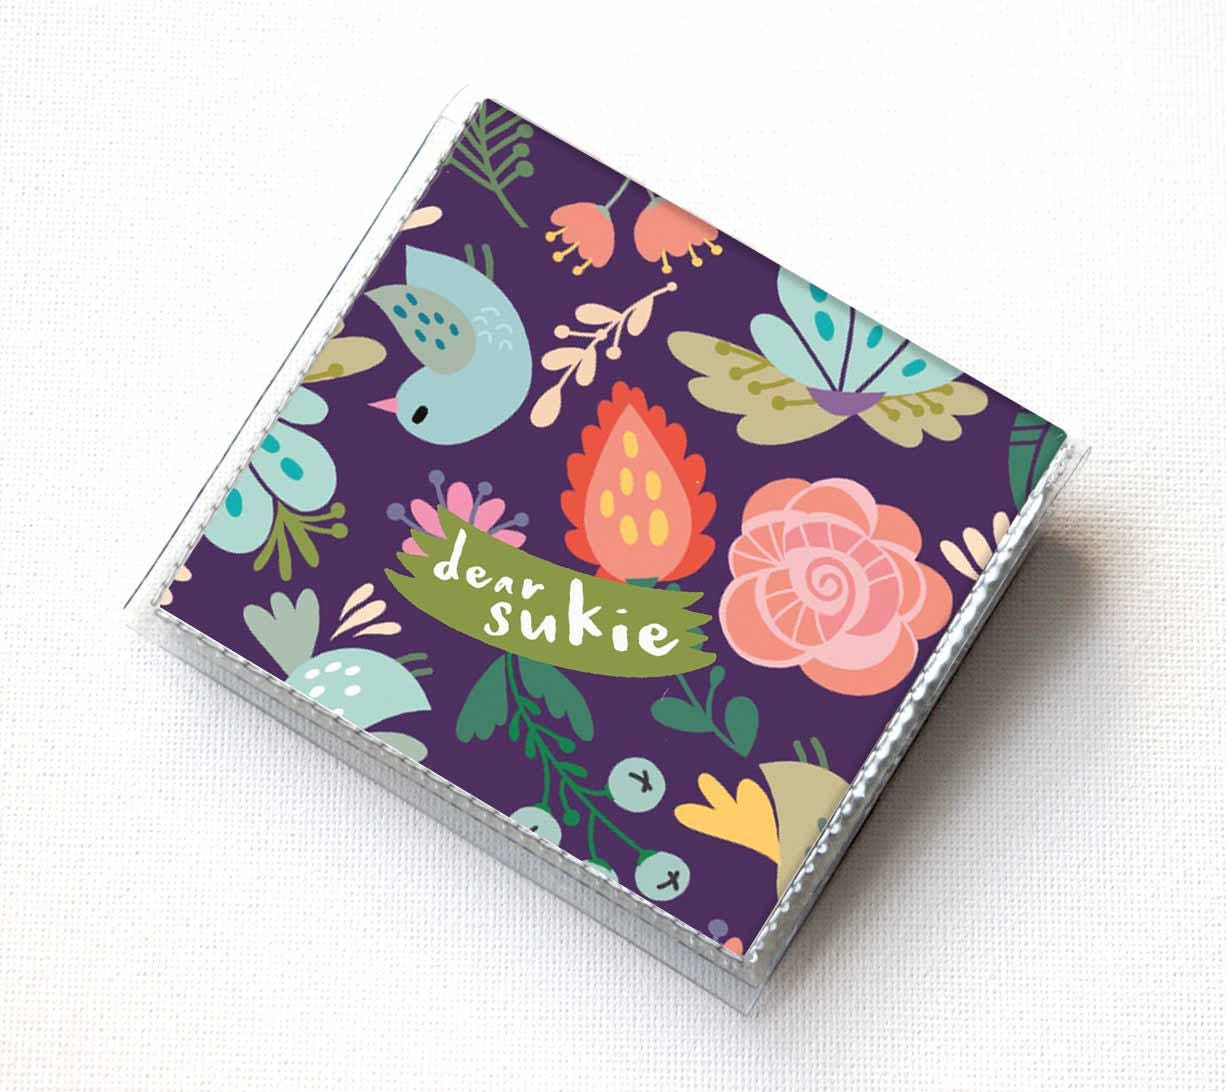 Handmade Vinyl Moo Square Card Holder - Gentle / case, vinyl, snap ...